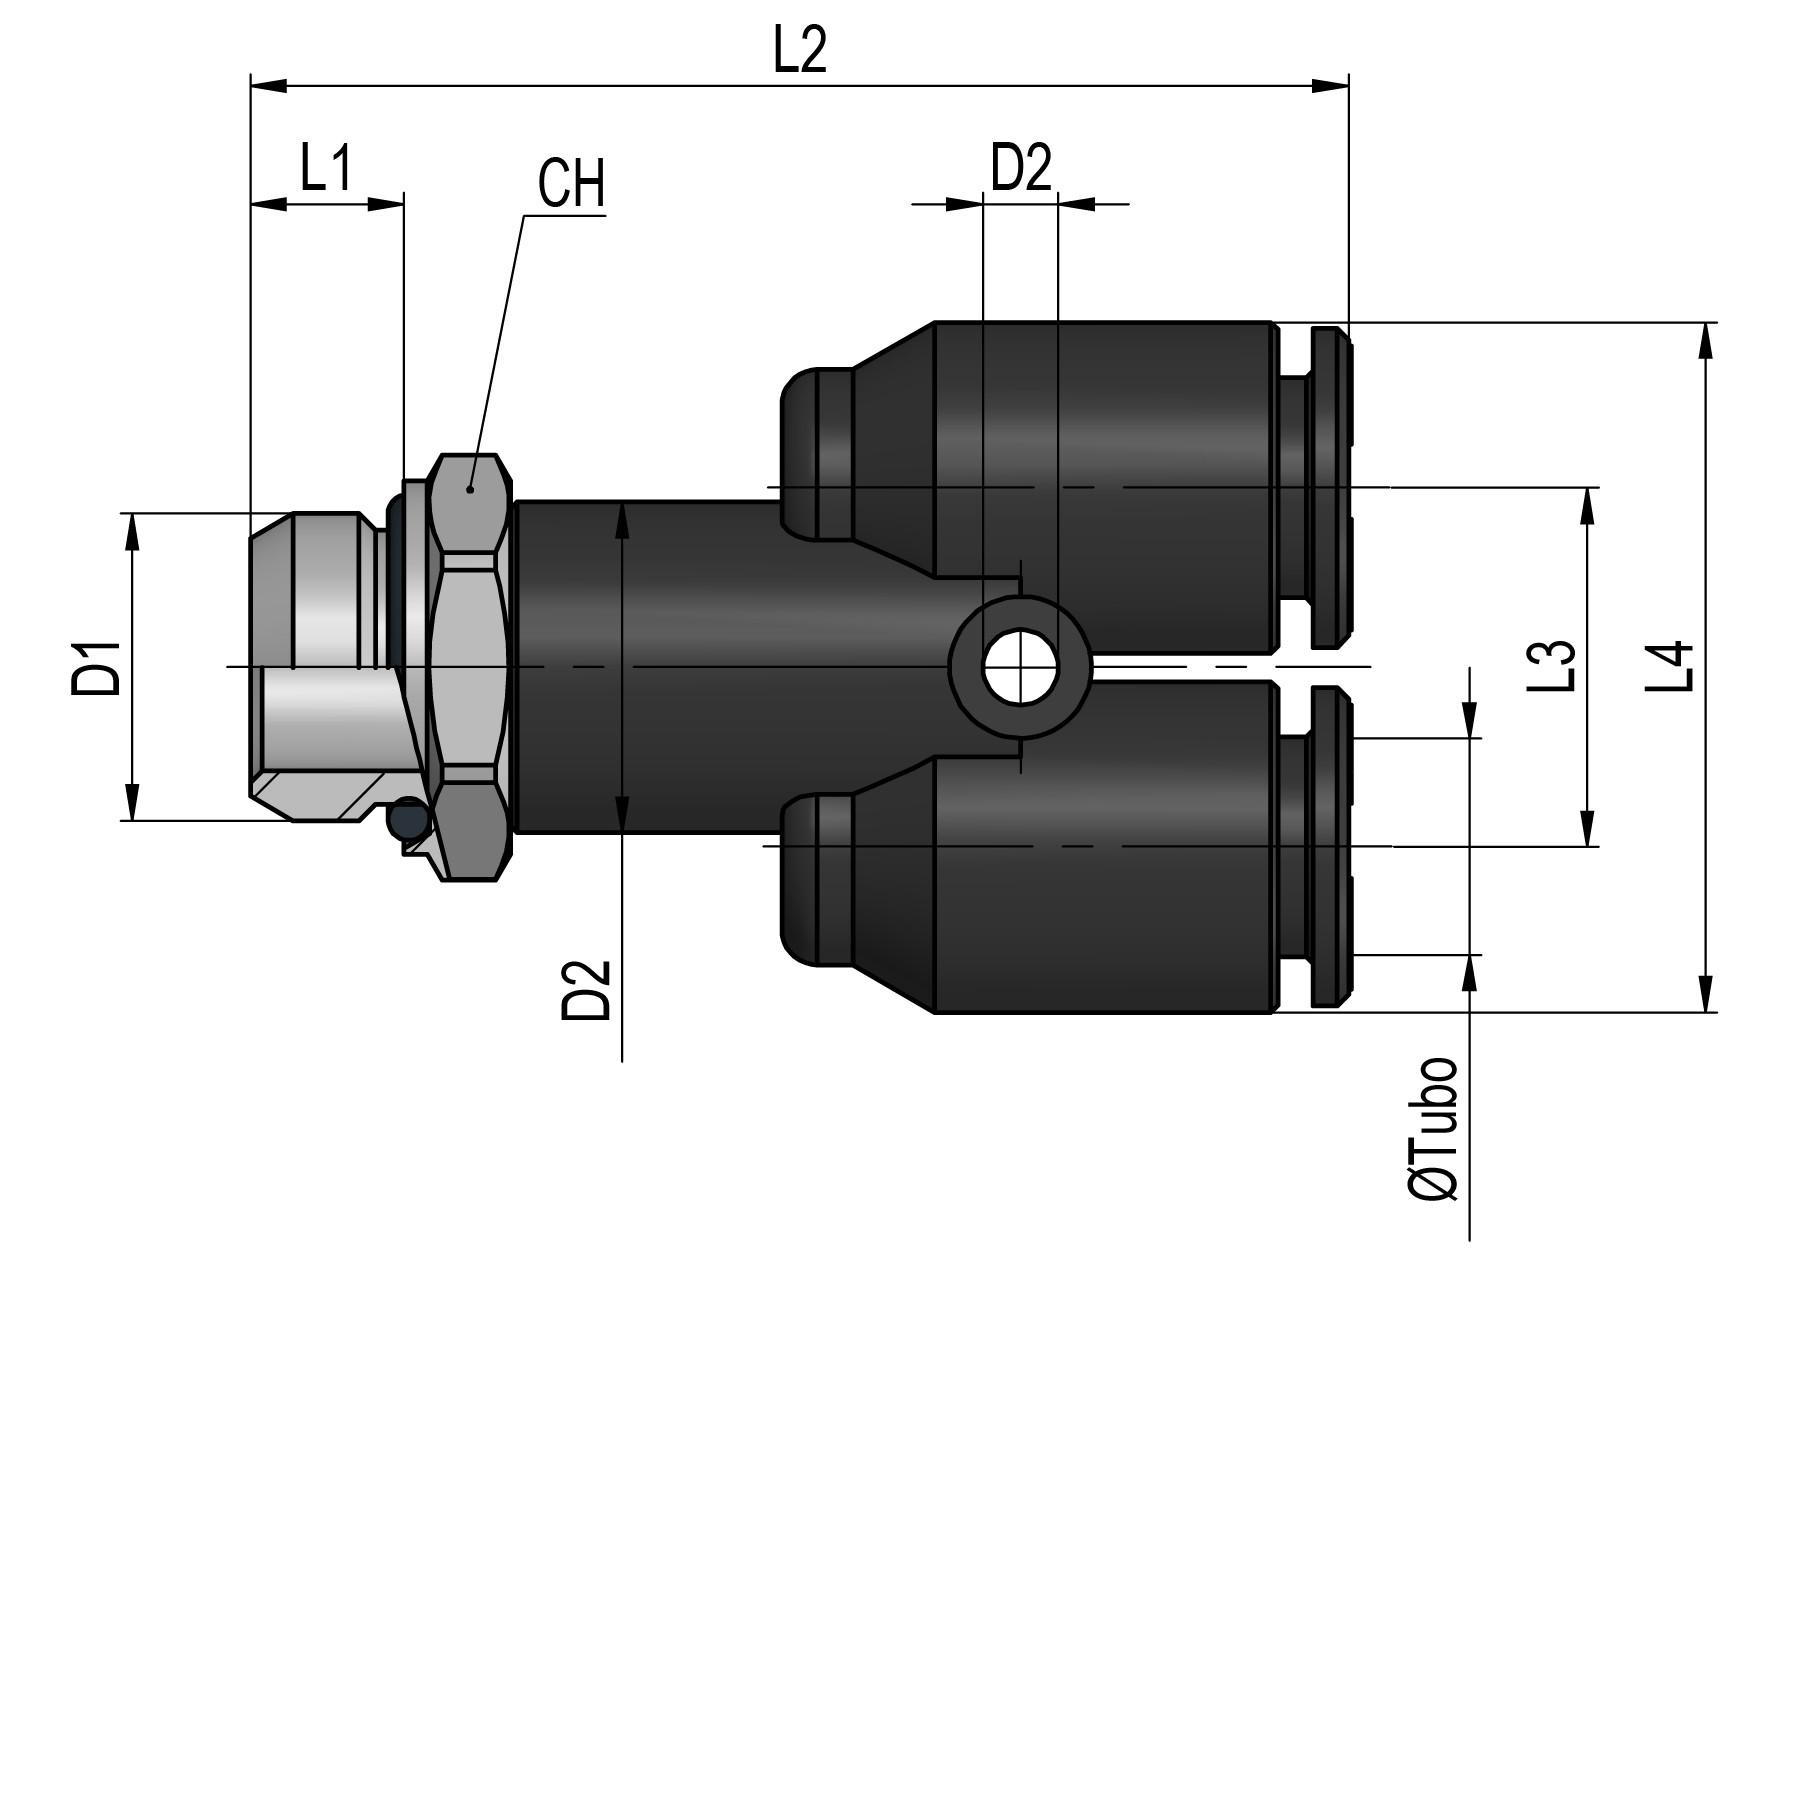 MB31 04 14